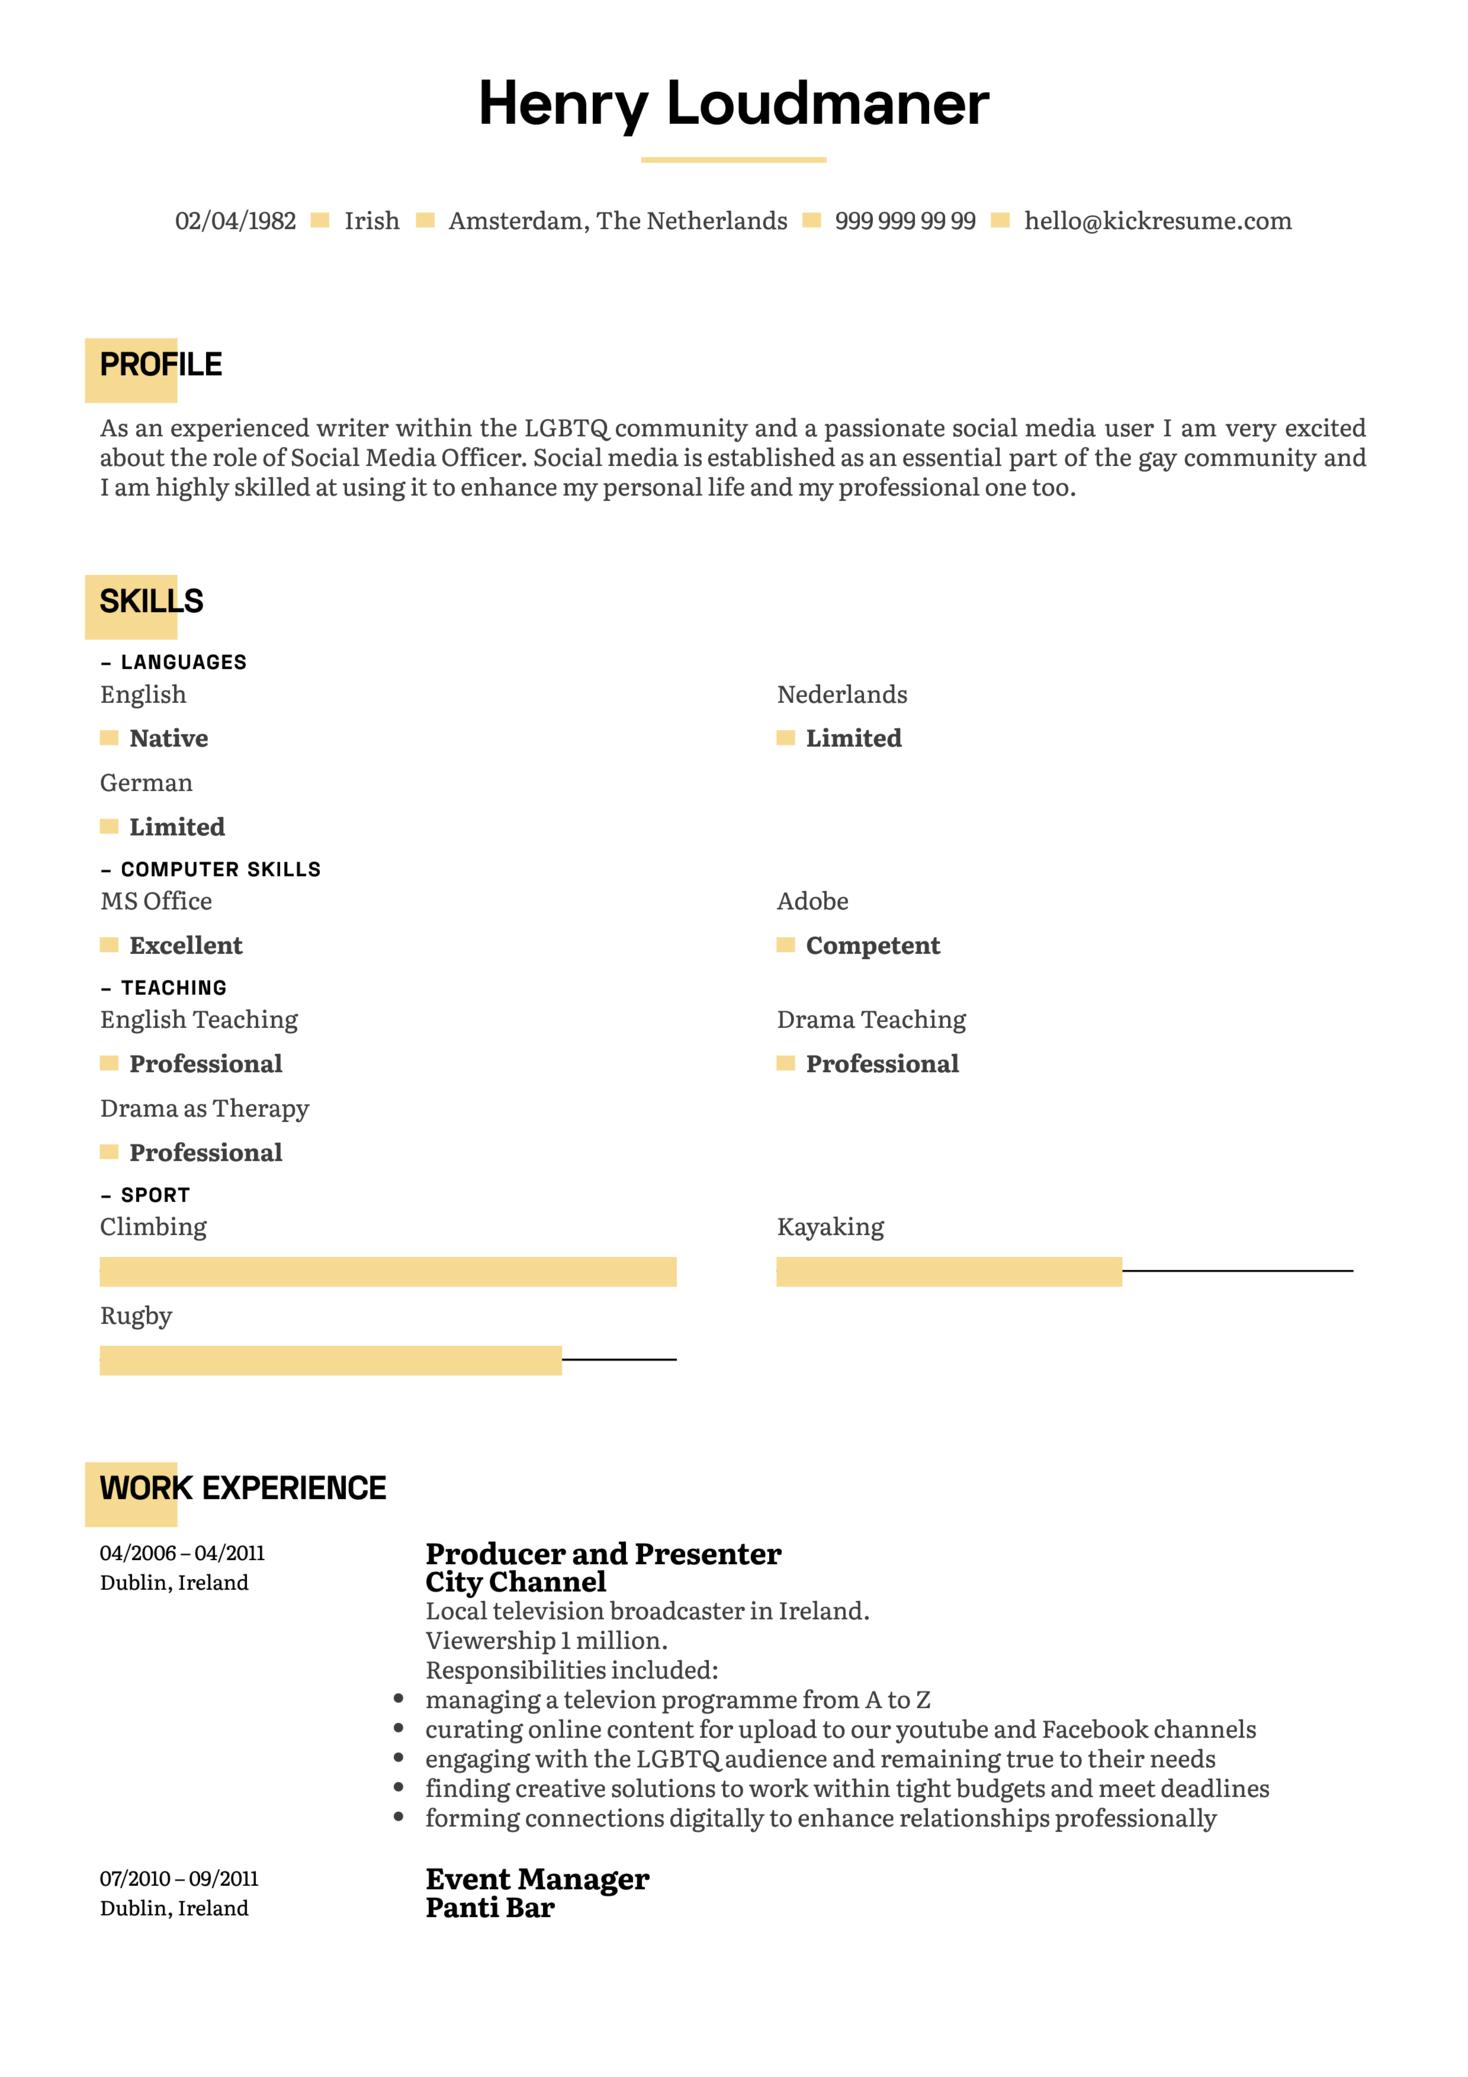 Producer & Presenter Resume Example (parte 1)